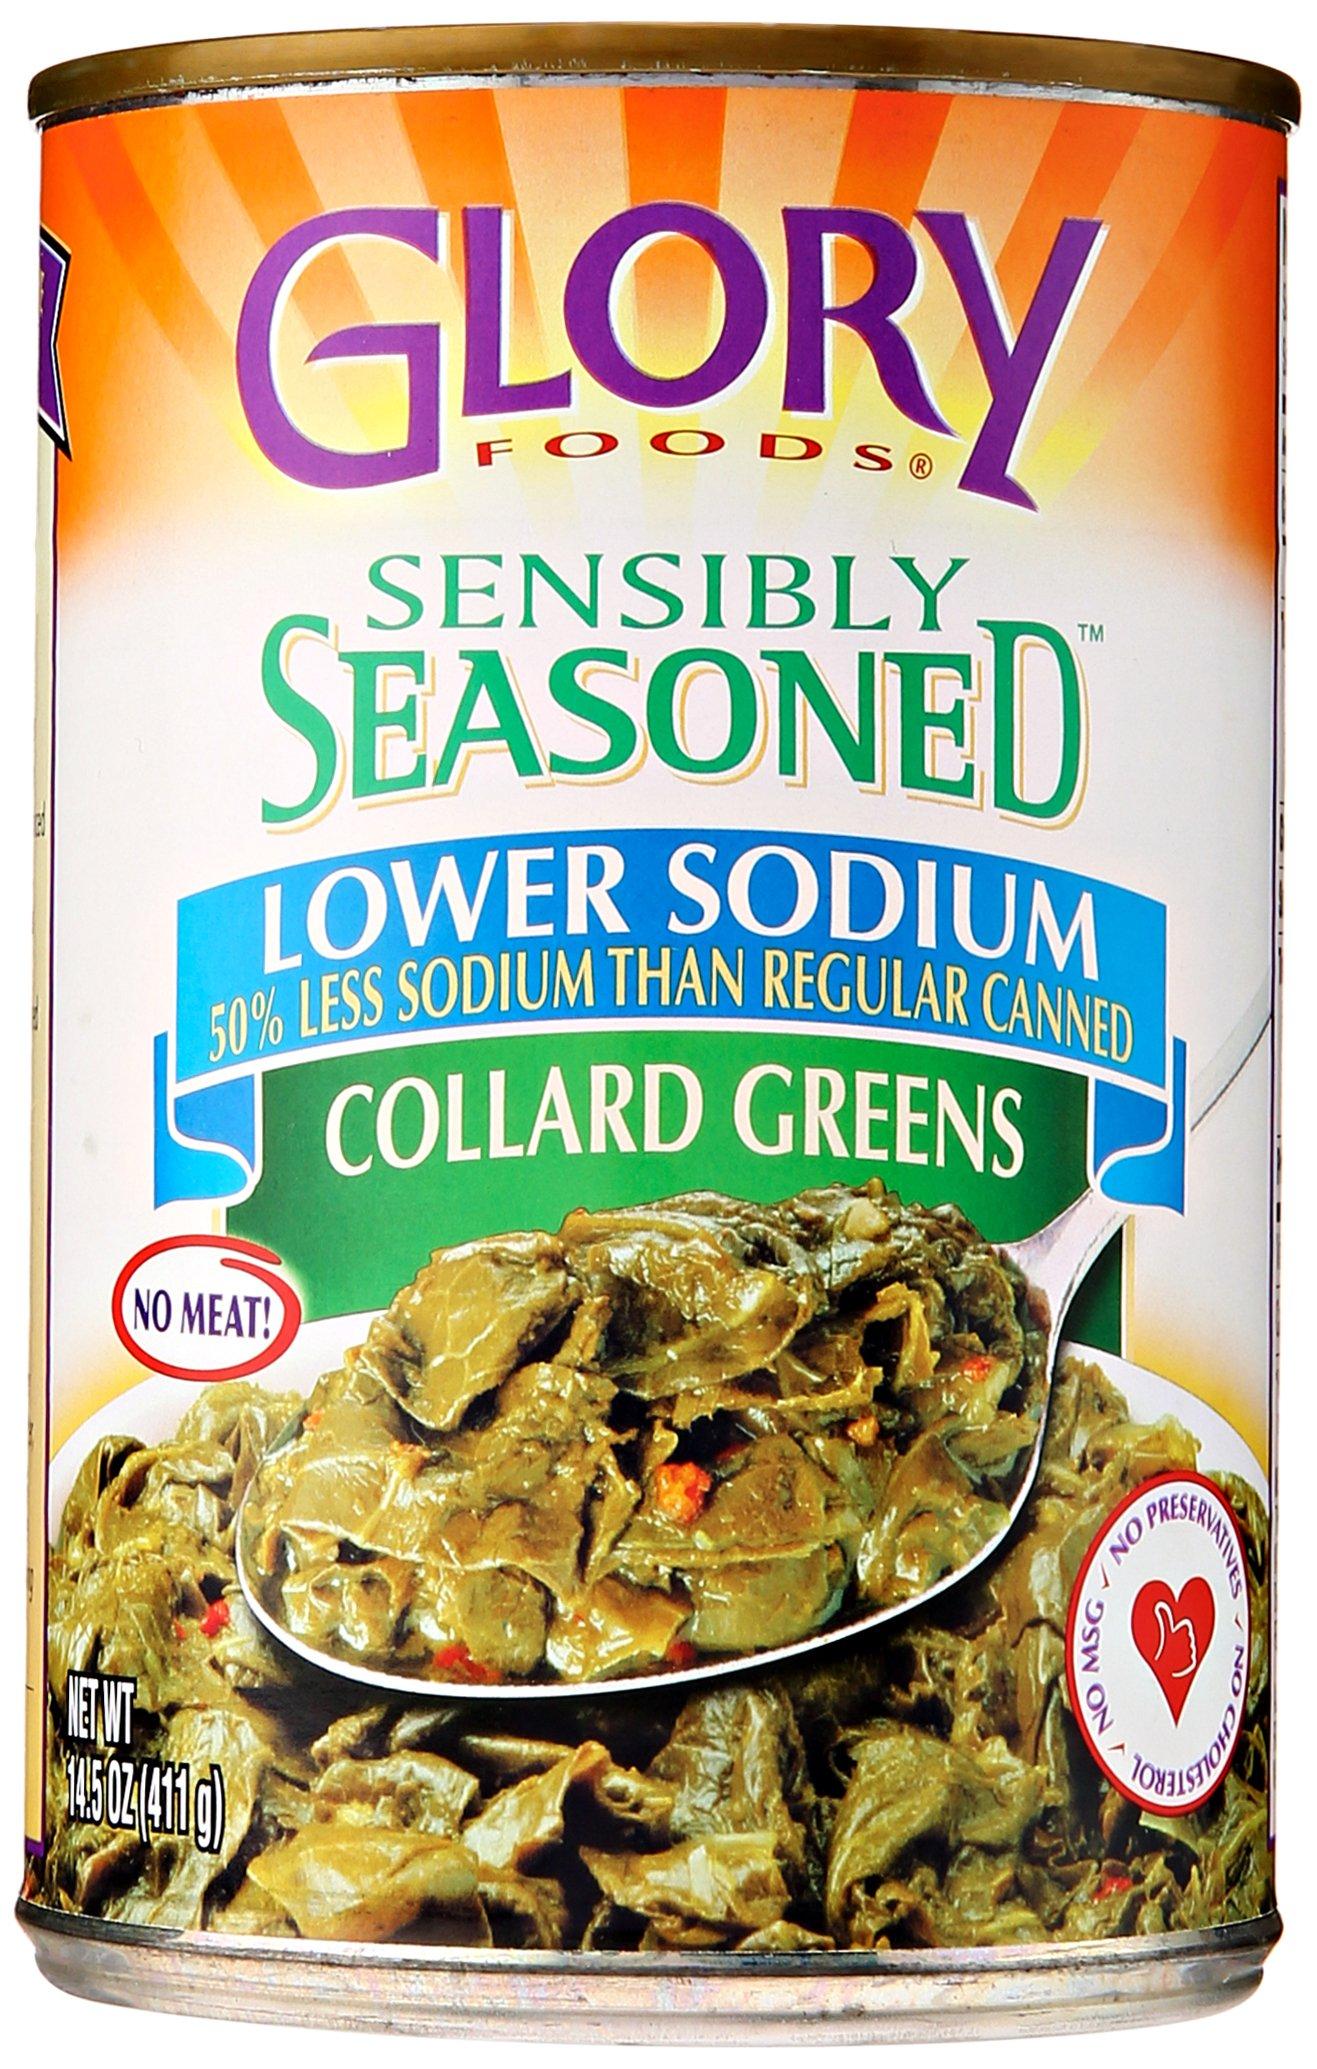 McCall Farms Glory Foods Sensibly Seasoned Lower Sodium Collard Greens, 14.5 oz by McCall Farms